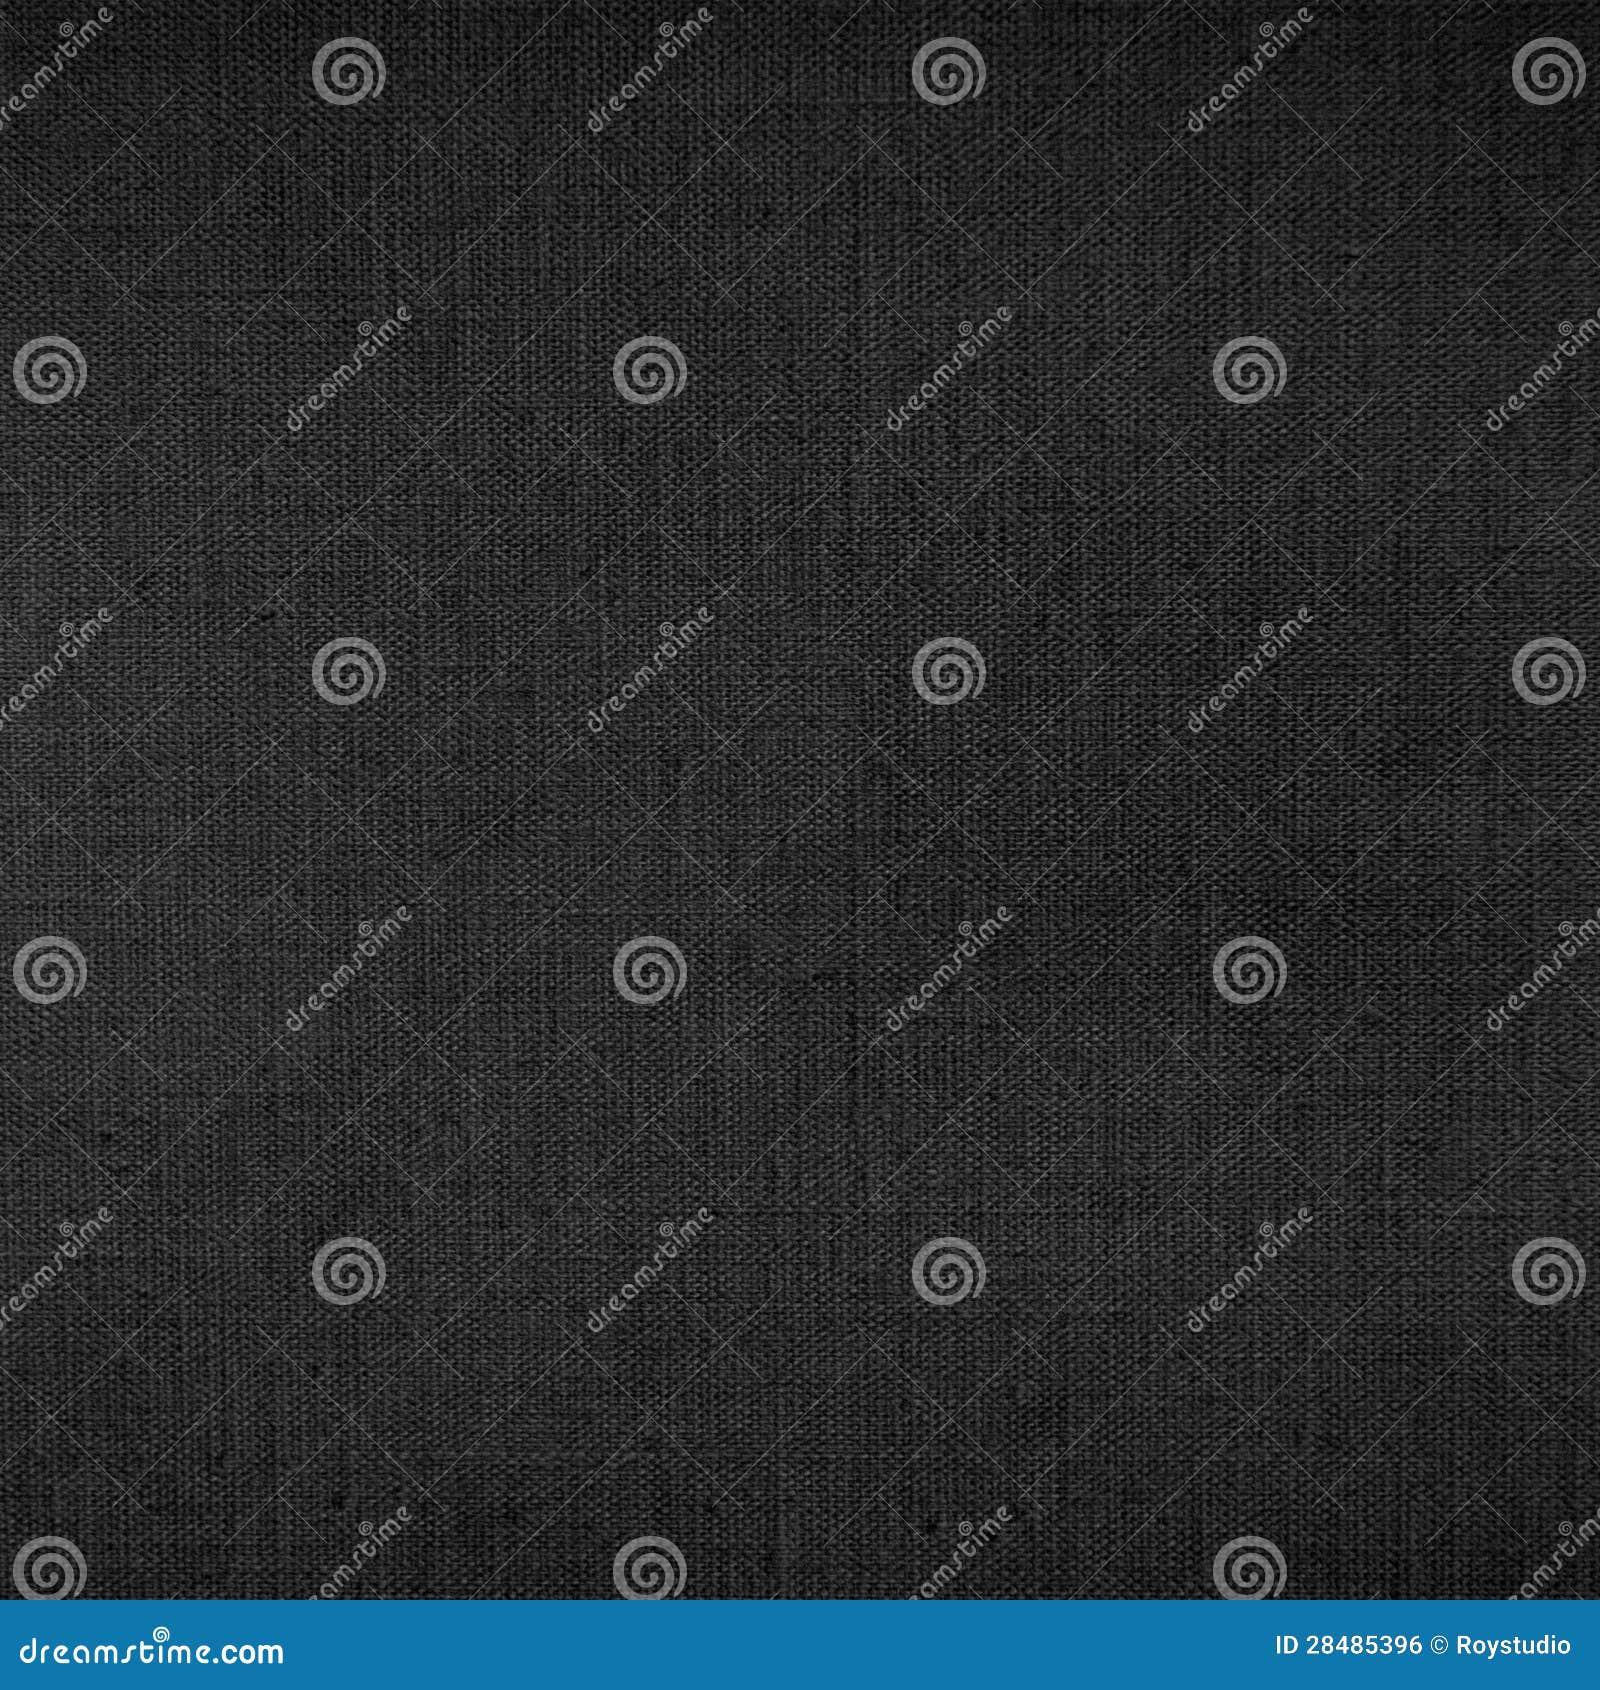 Black Canvas Background : Black canvas texture background delicate striped pattern